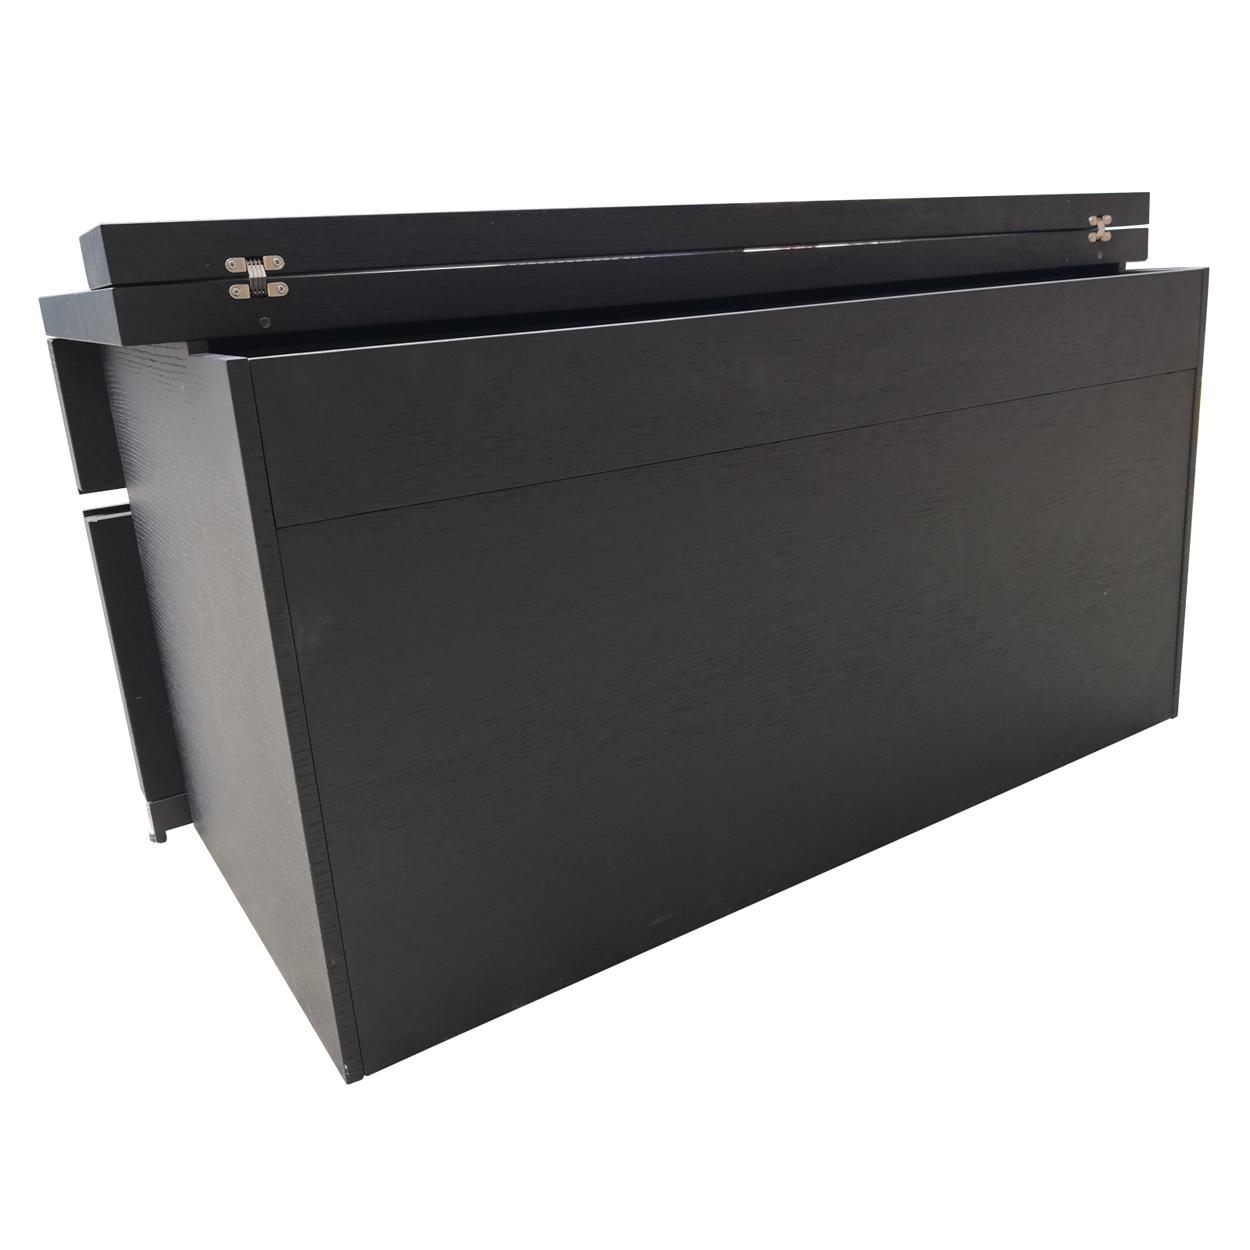 Two Design Lovers dark veneer filing cabinet back